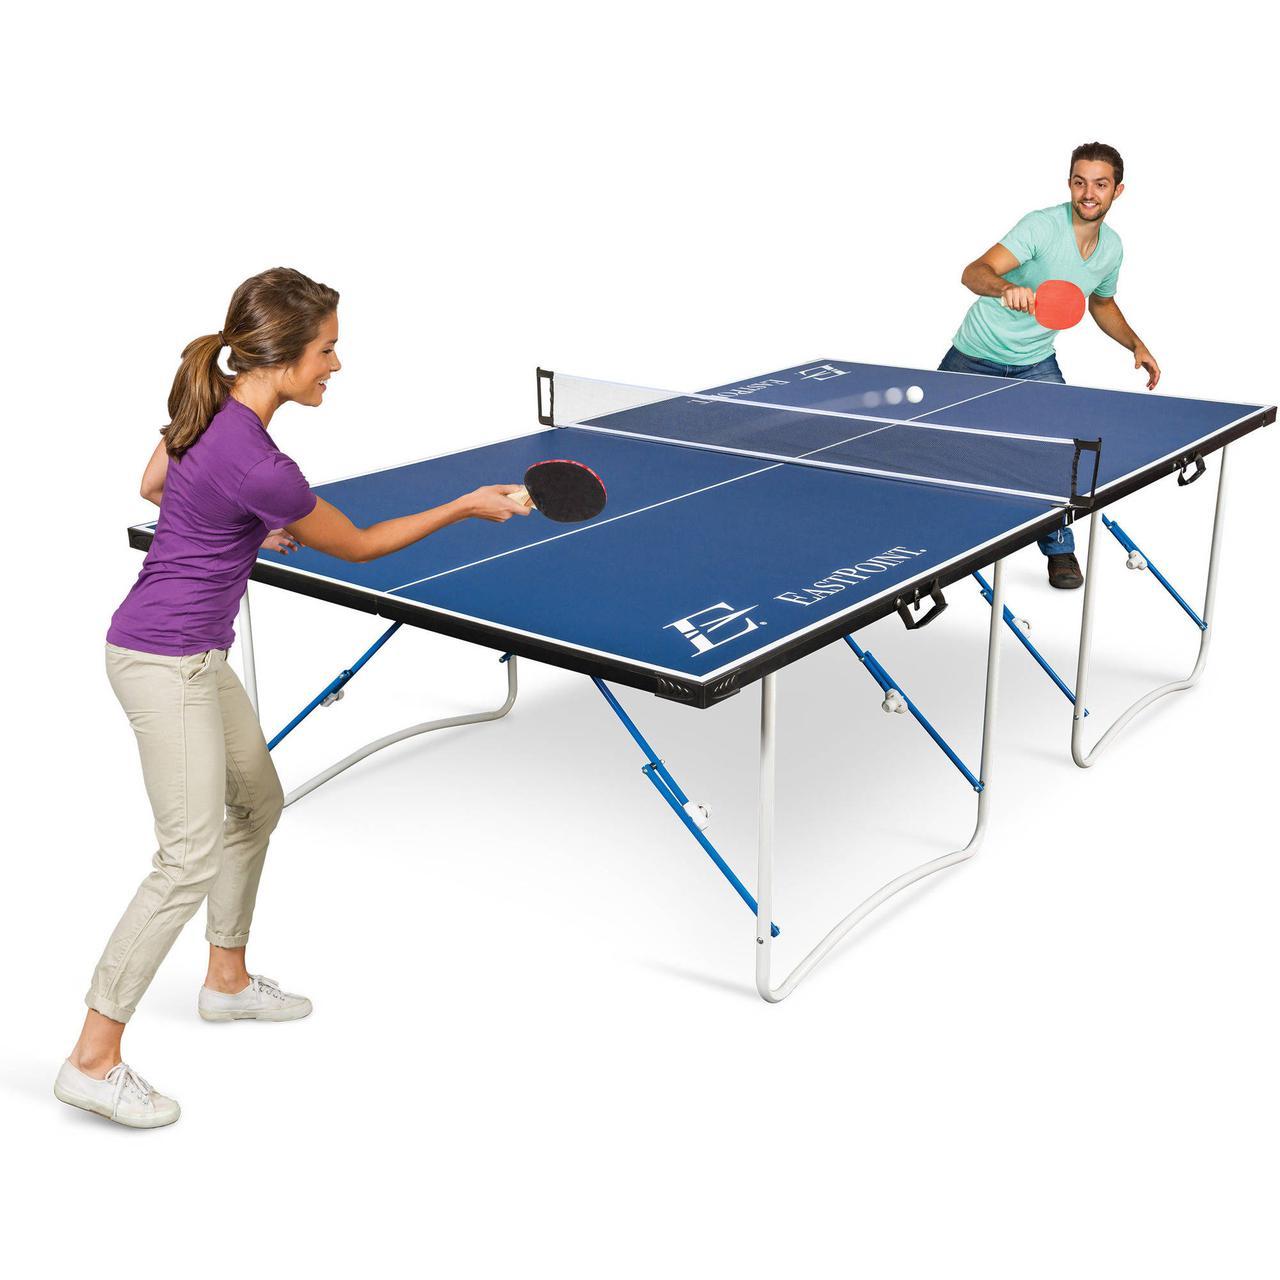 Теннис пинг понг картинки